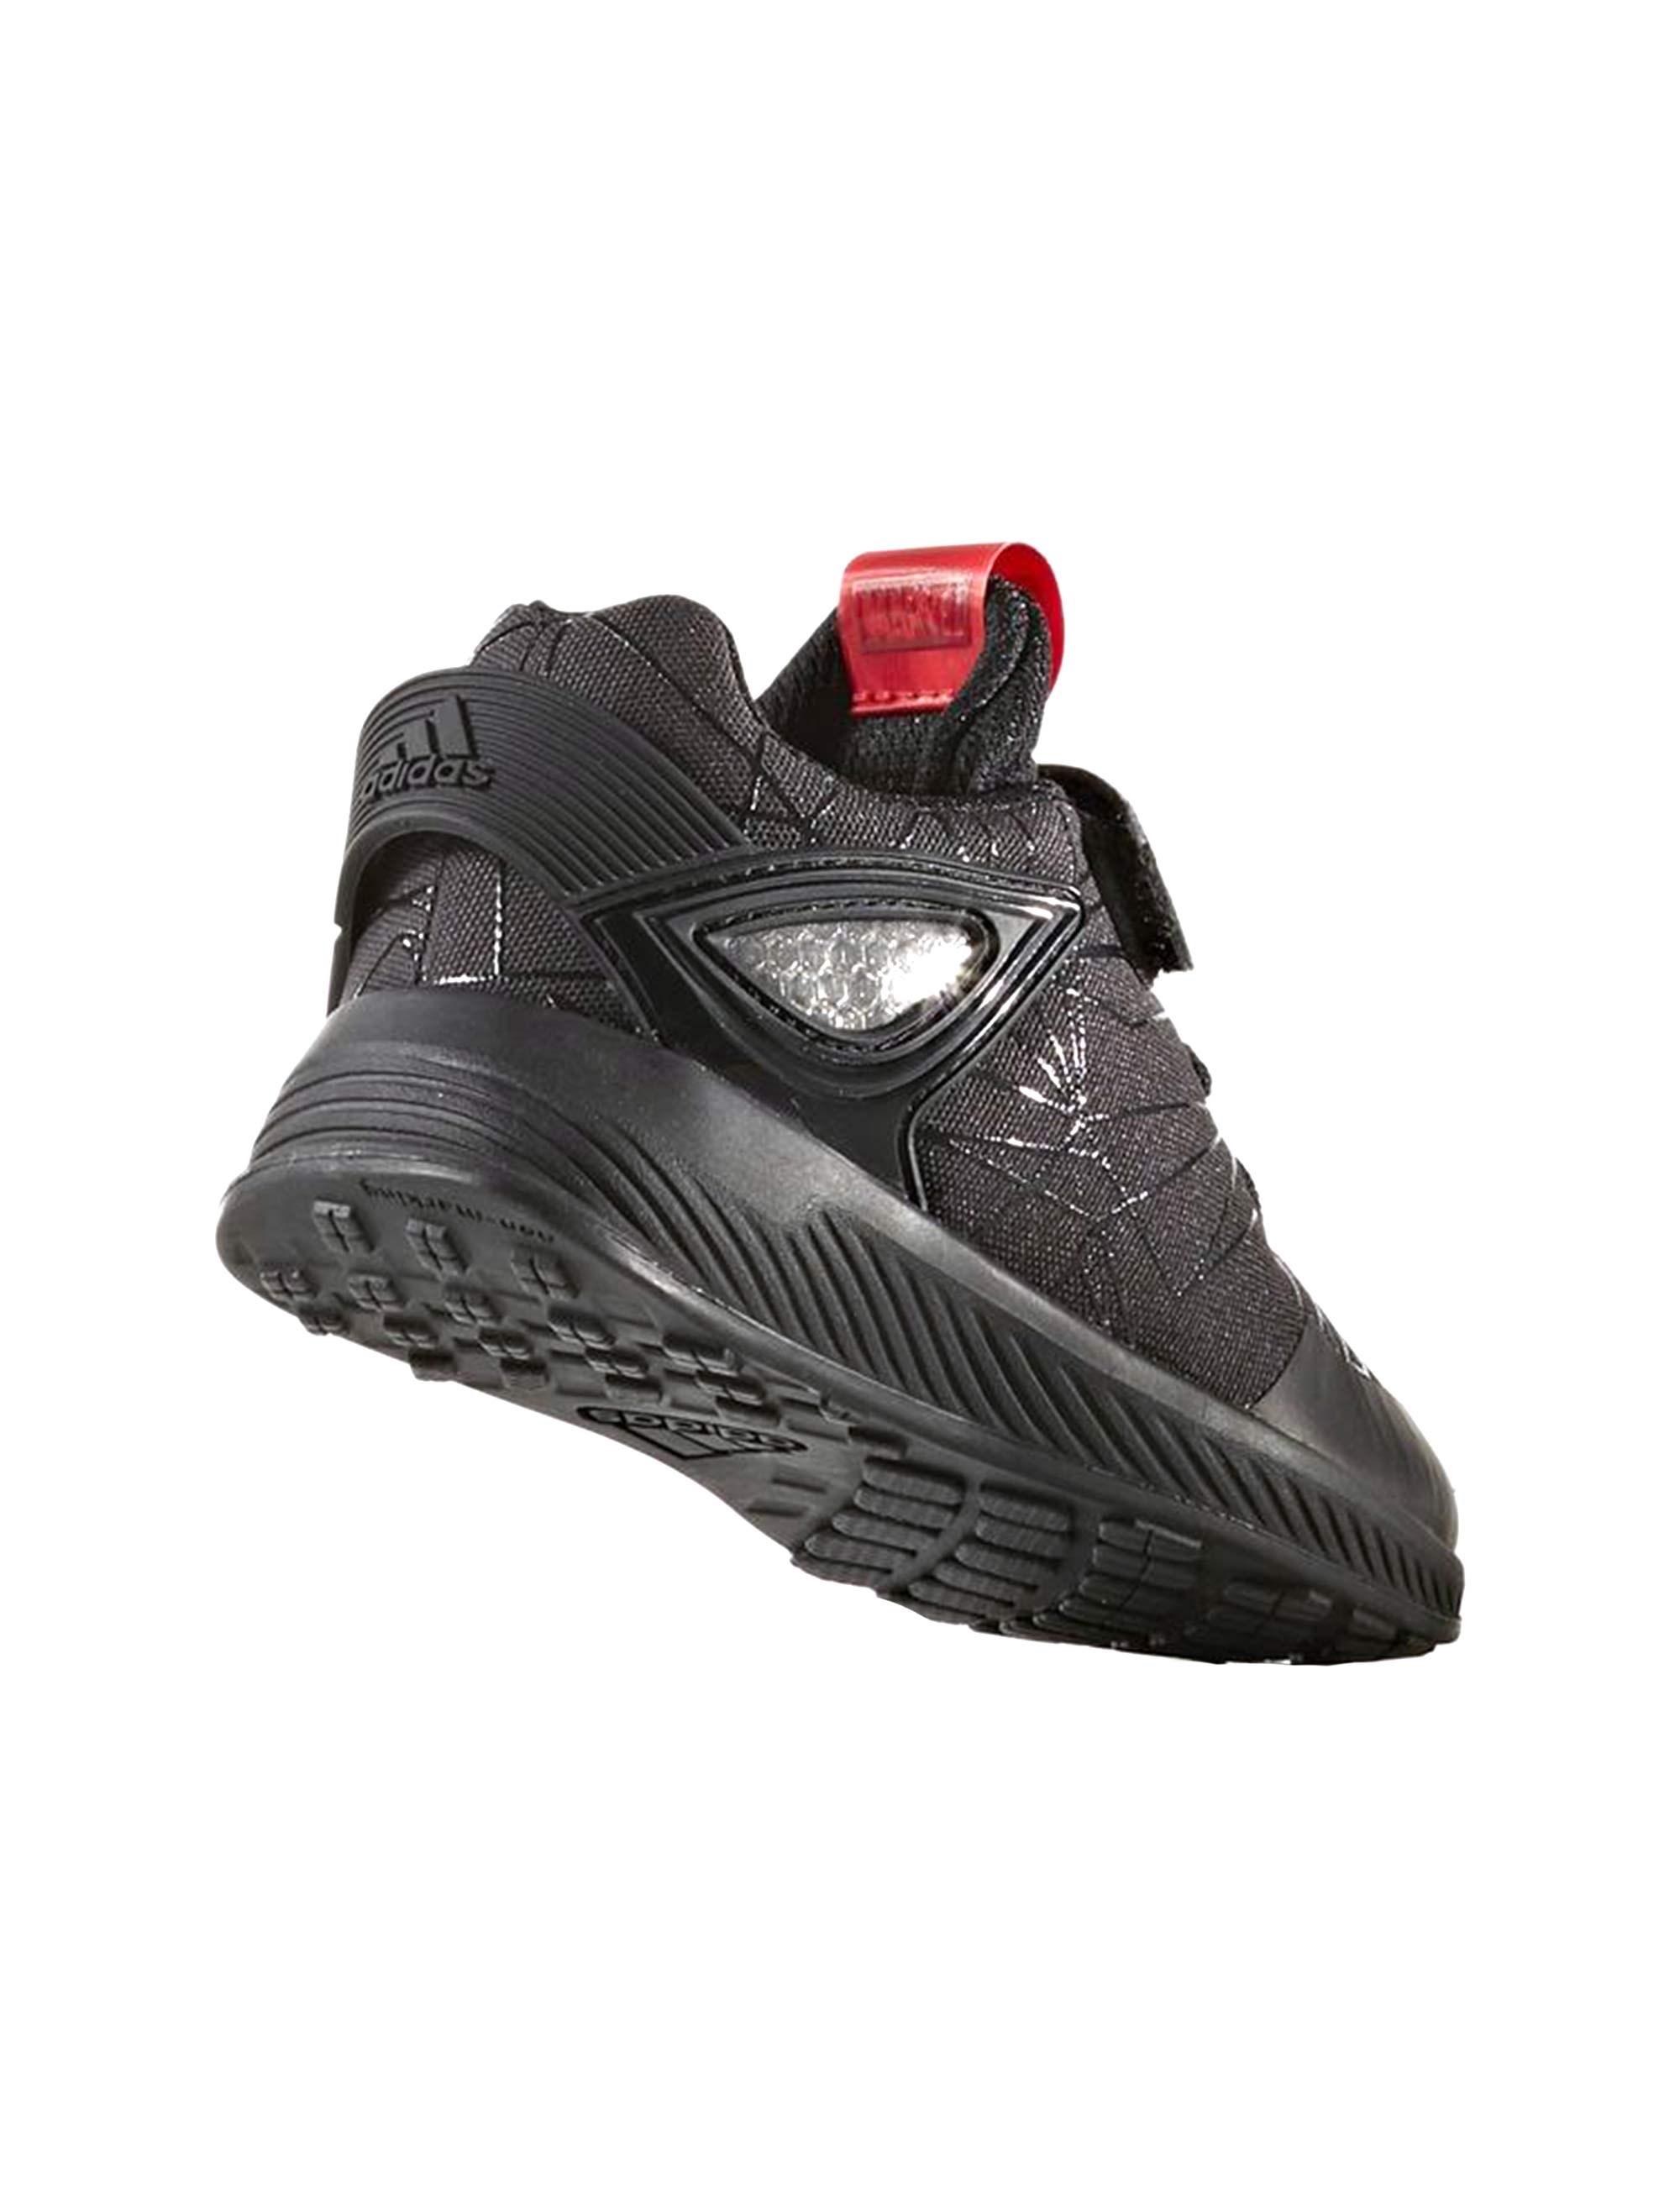 کفش دویدن بندی پسرانه Spider-Man RapidaRun I - آدیداس - مشکي - 5